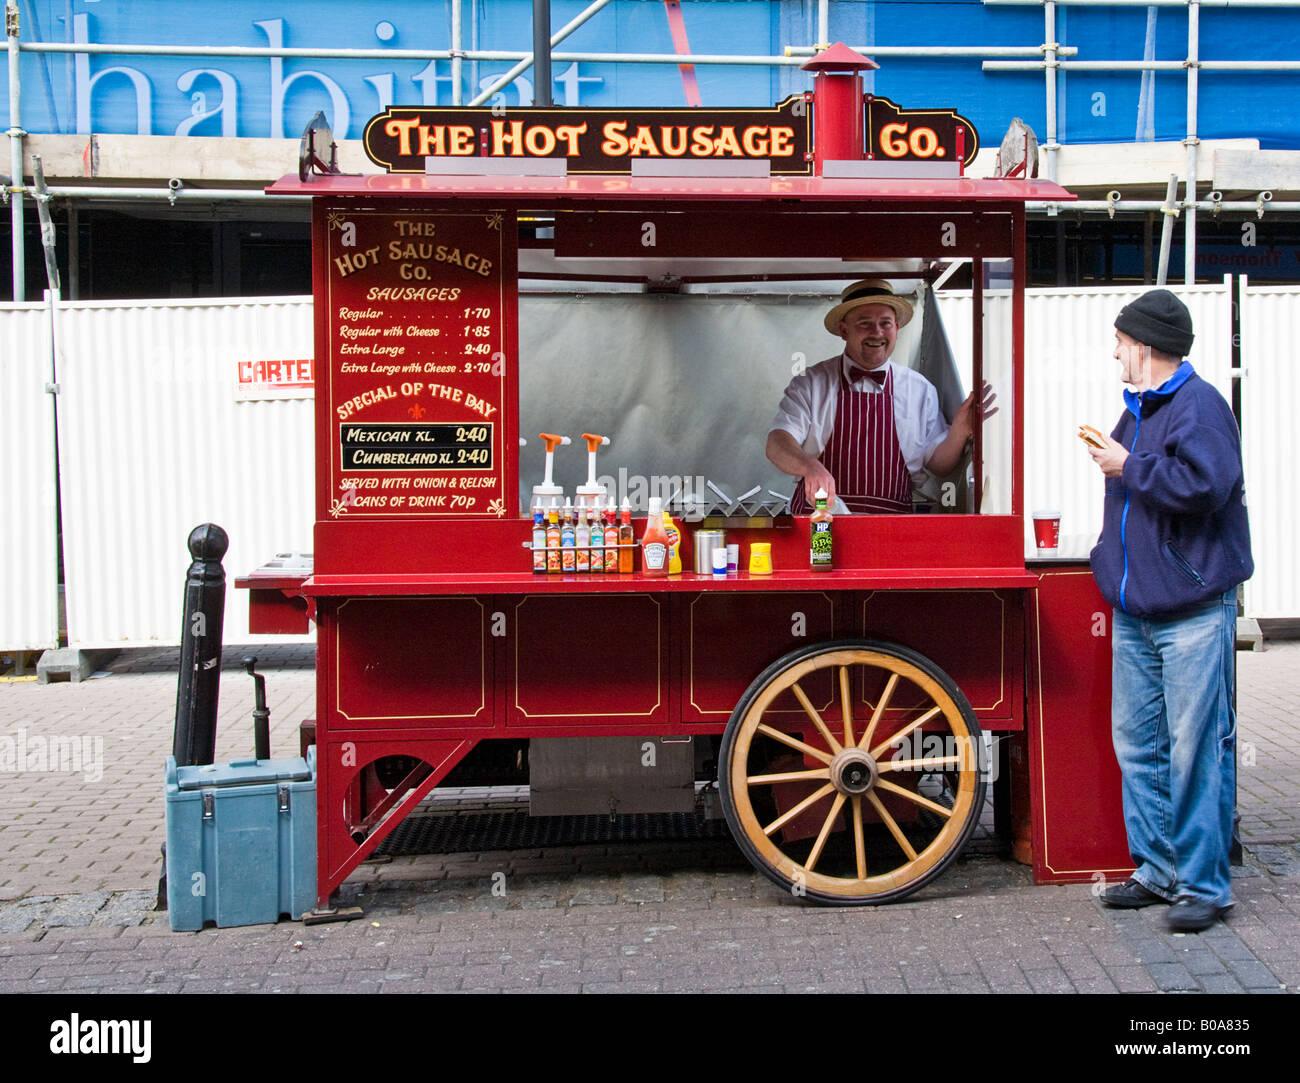 Hot Dog Stall Stock Photos & Hot Dog Stall Stock Images - Alamy